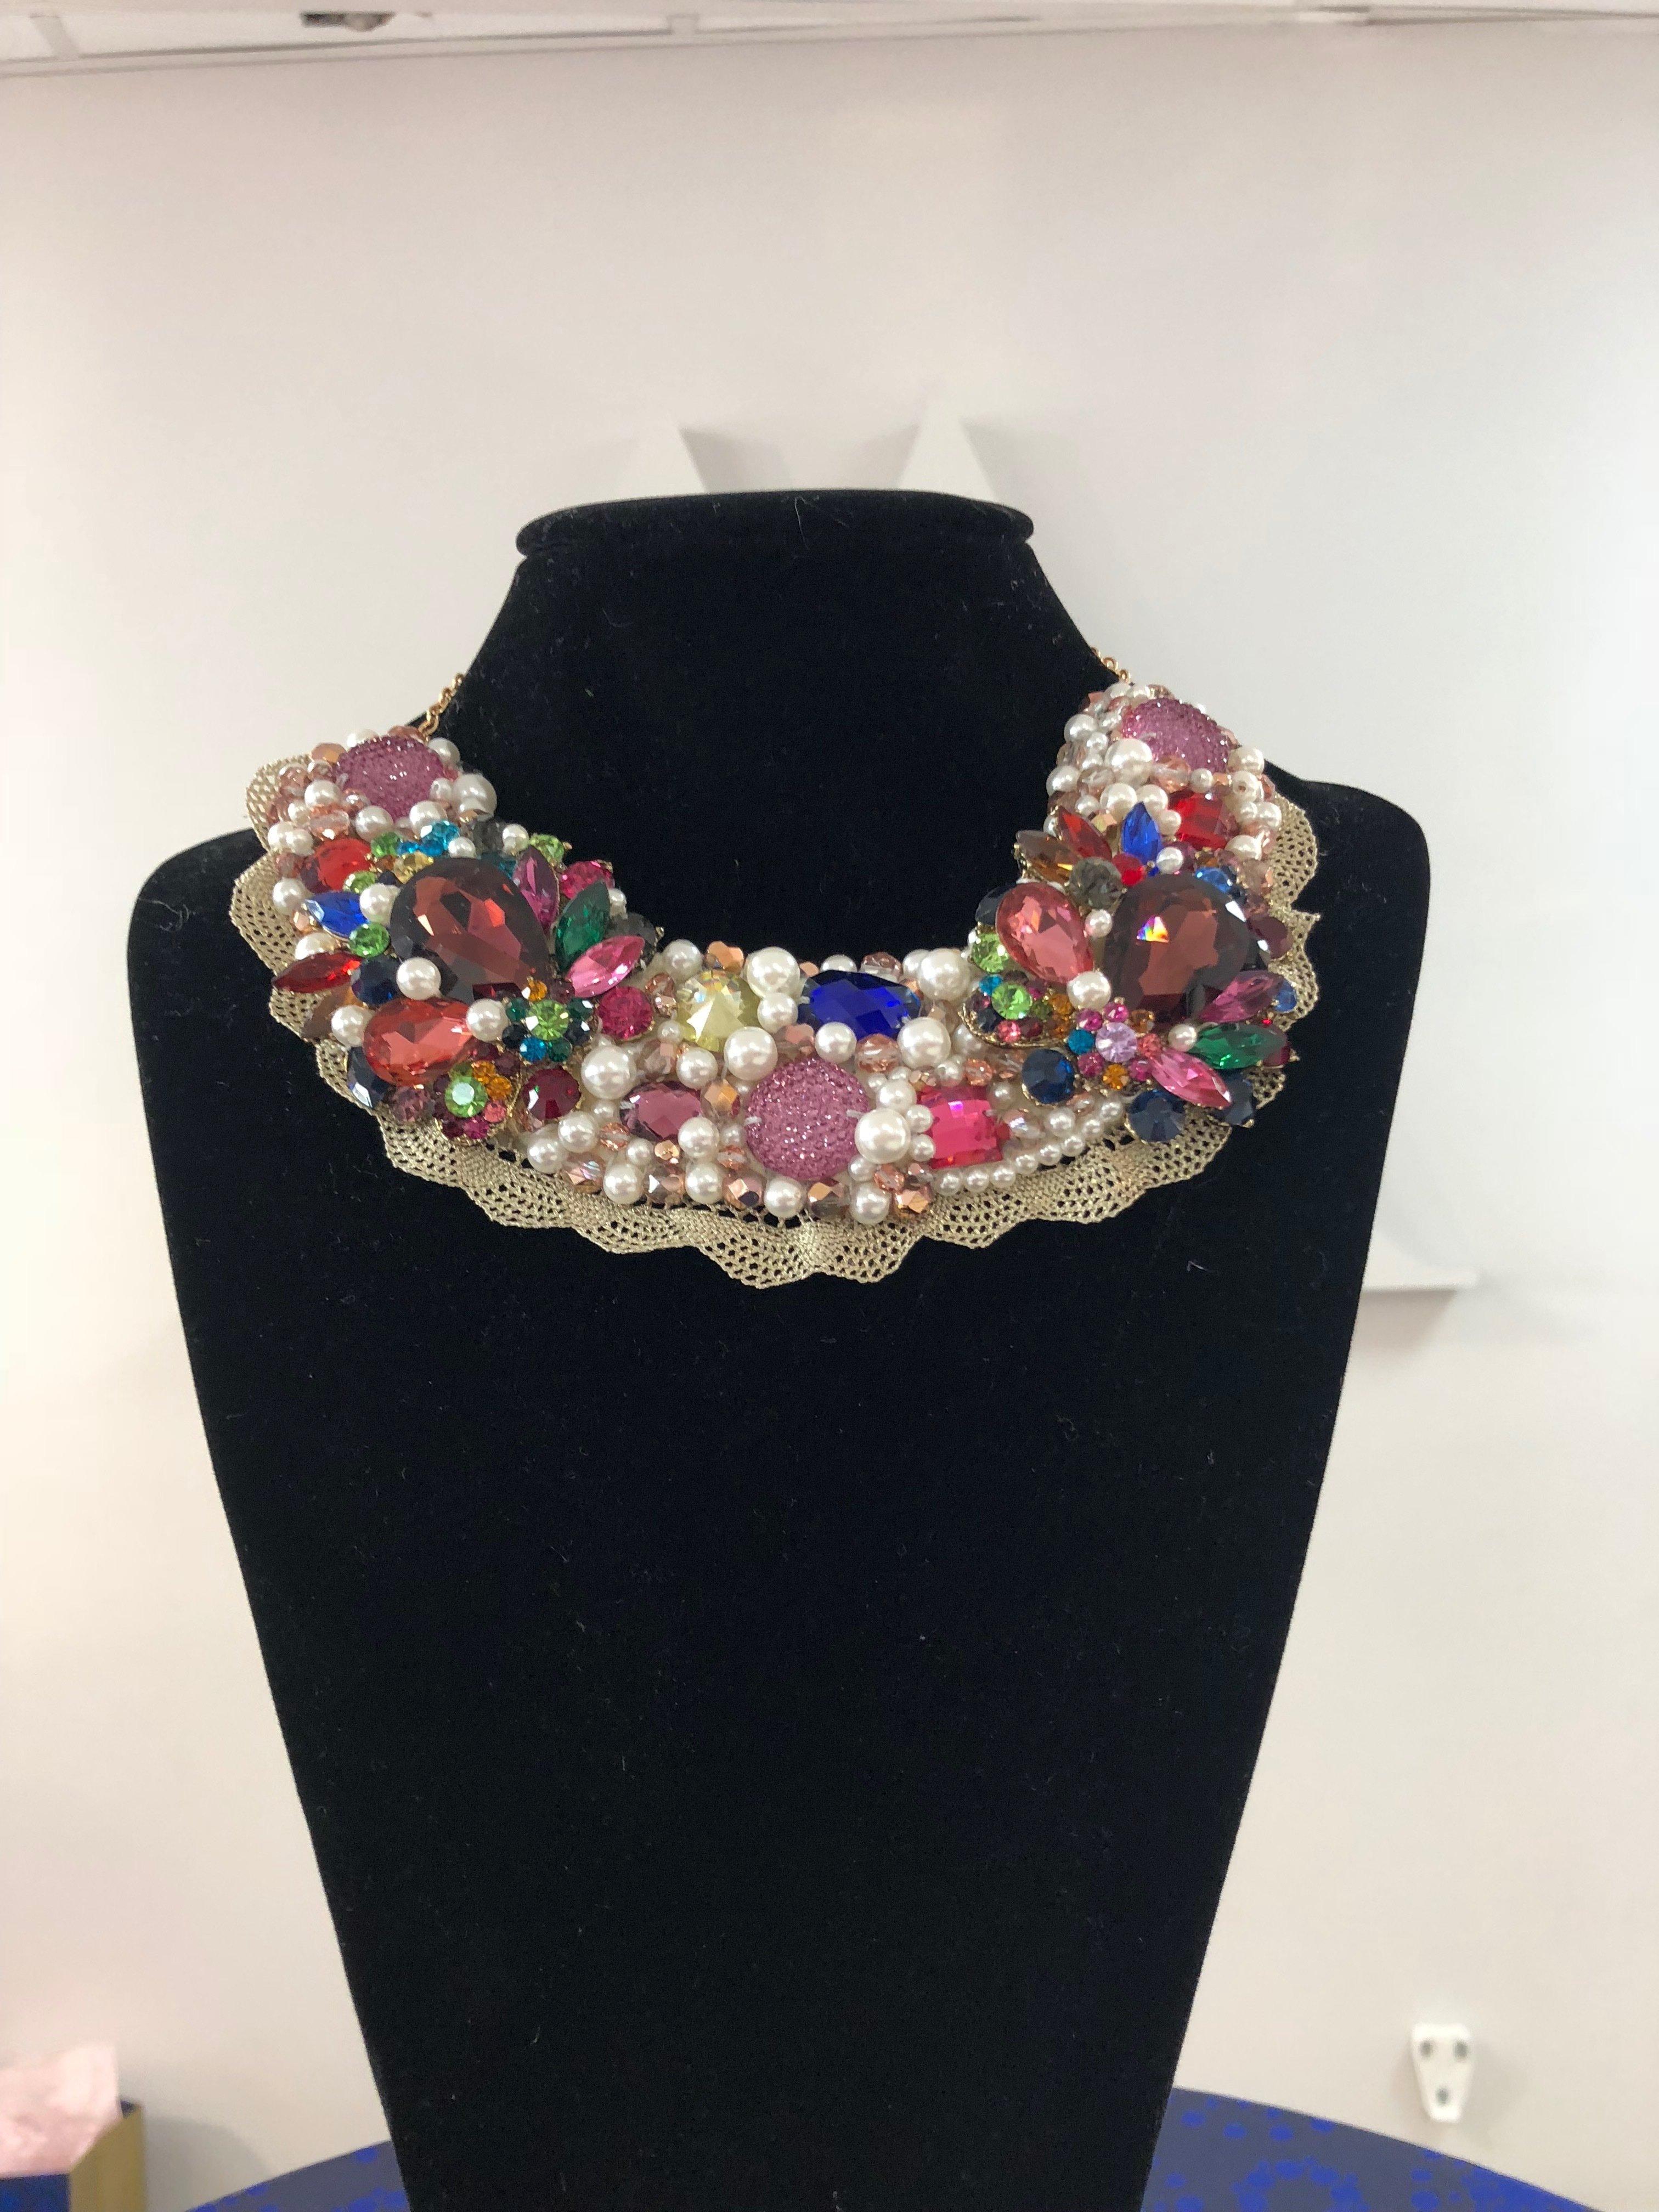 Aisling Maher Collar pearl/plum/multi 5NMJ1Y6J57W0E